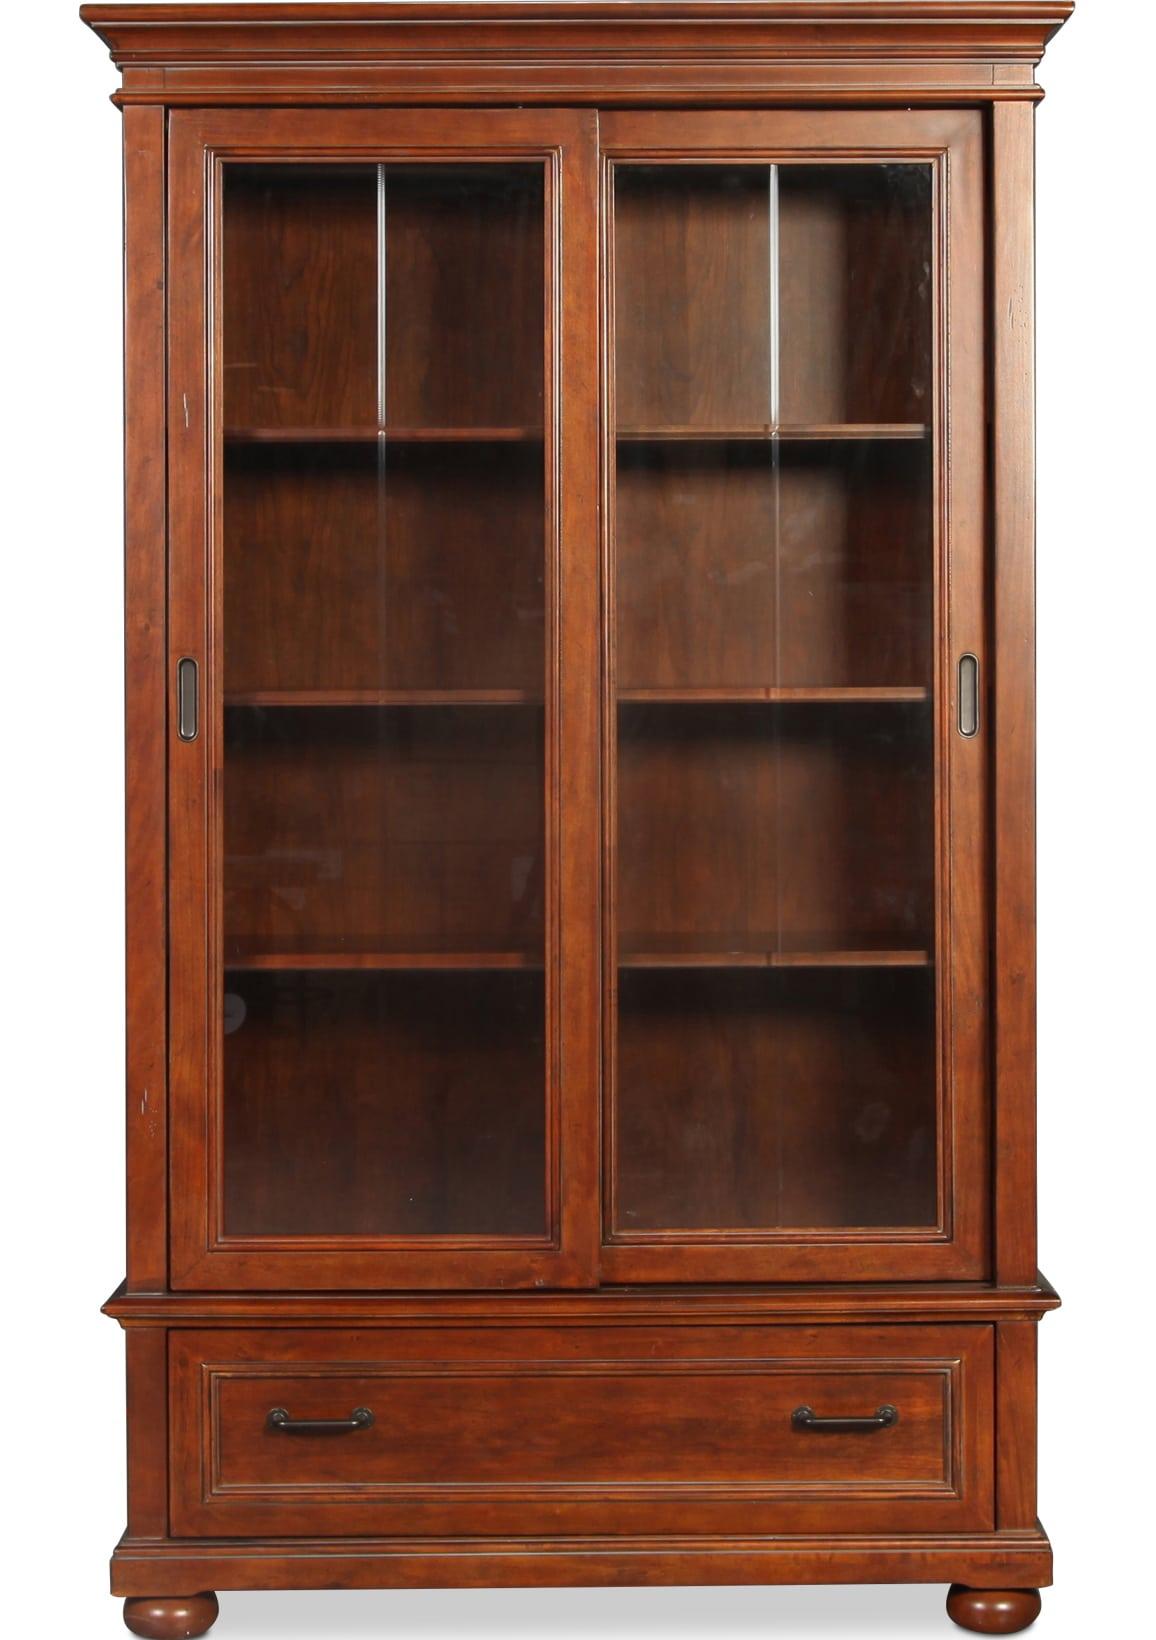 Ares Sliding Door Bookcase - Chestnut